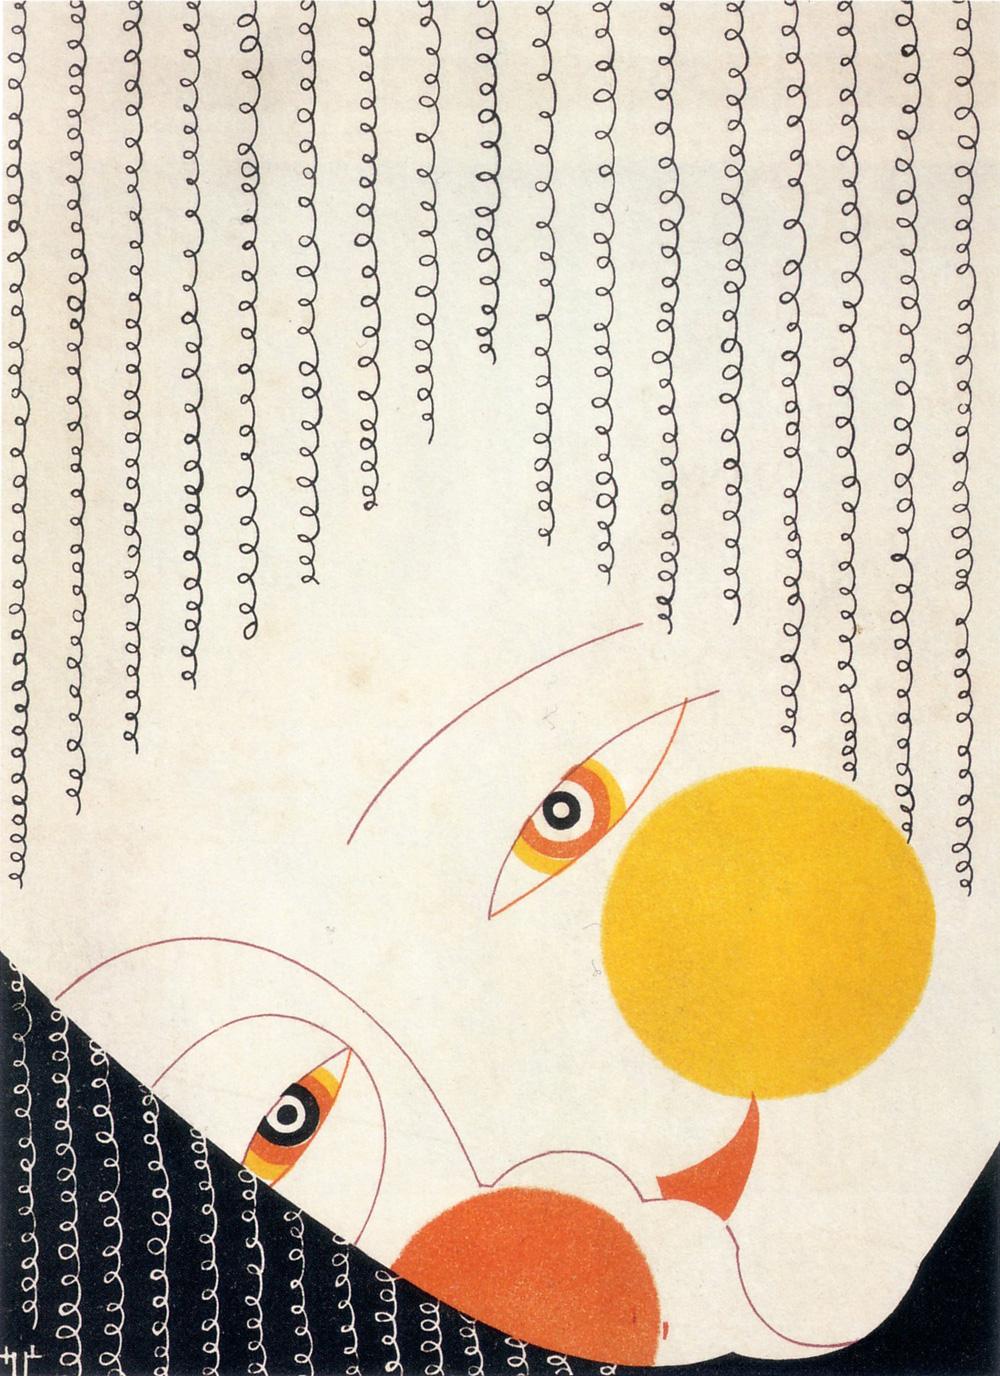 Poster design 1920s - Modernist